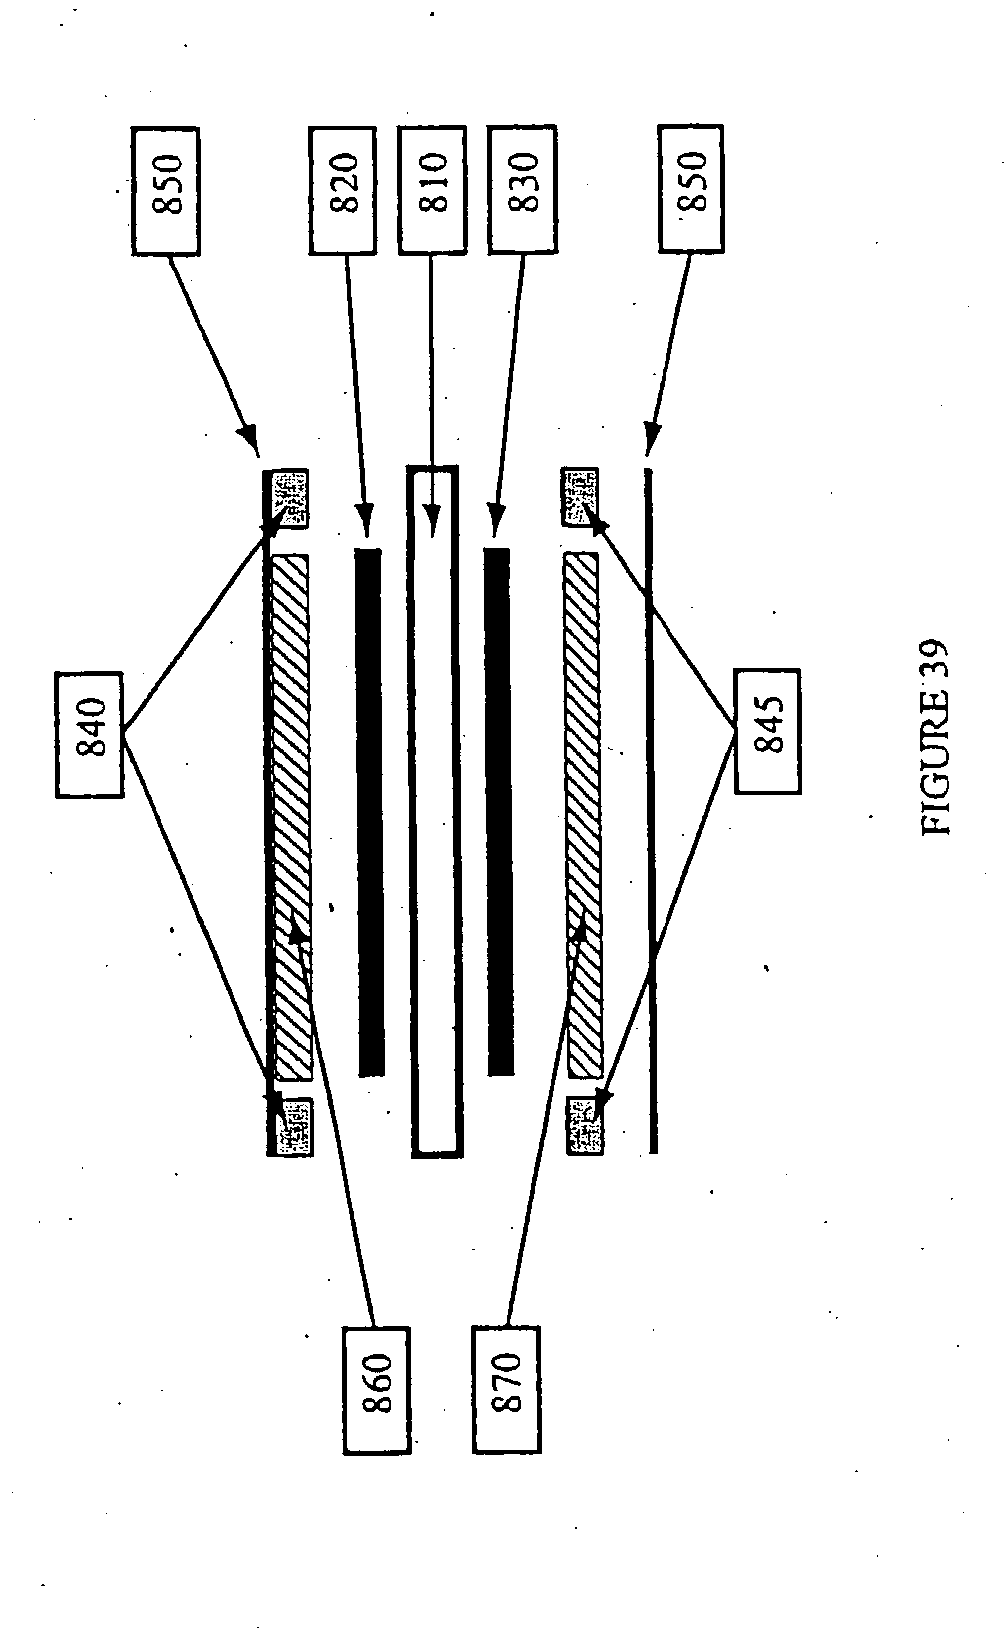 Vapor Fuel System Patent Patent Us4177779 Fuel Economy